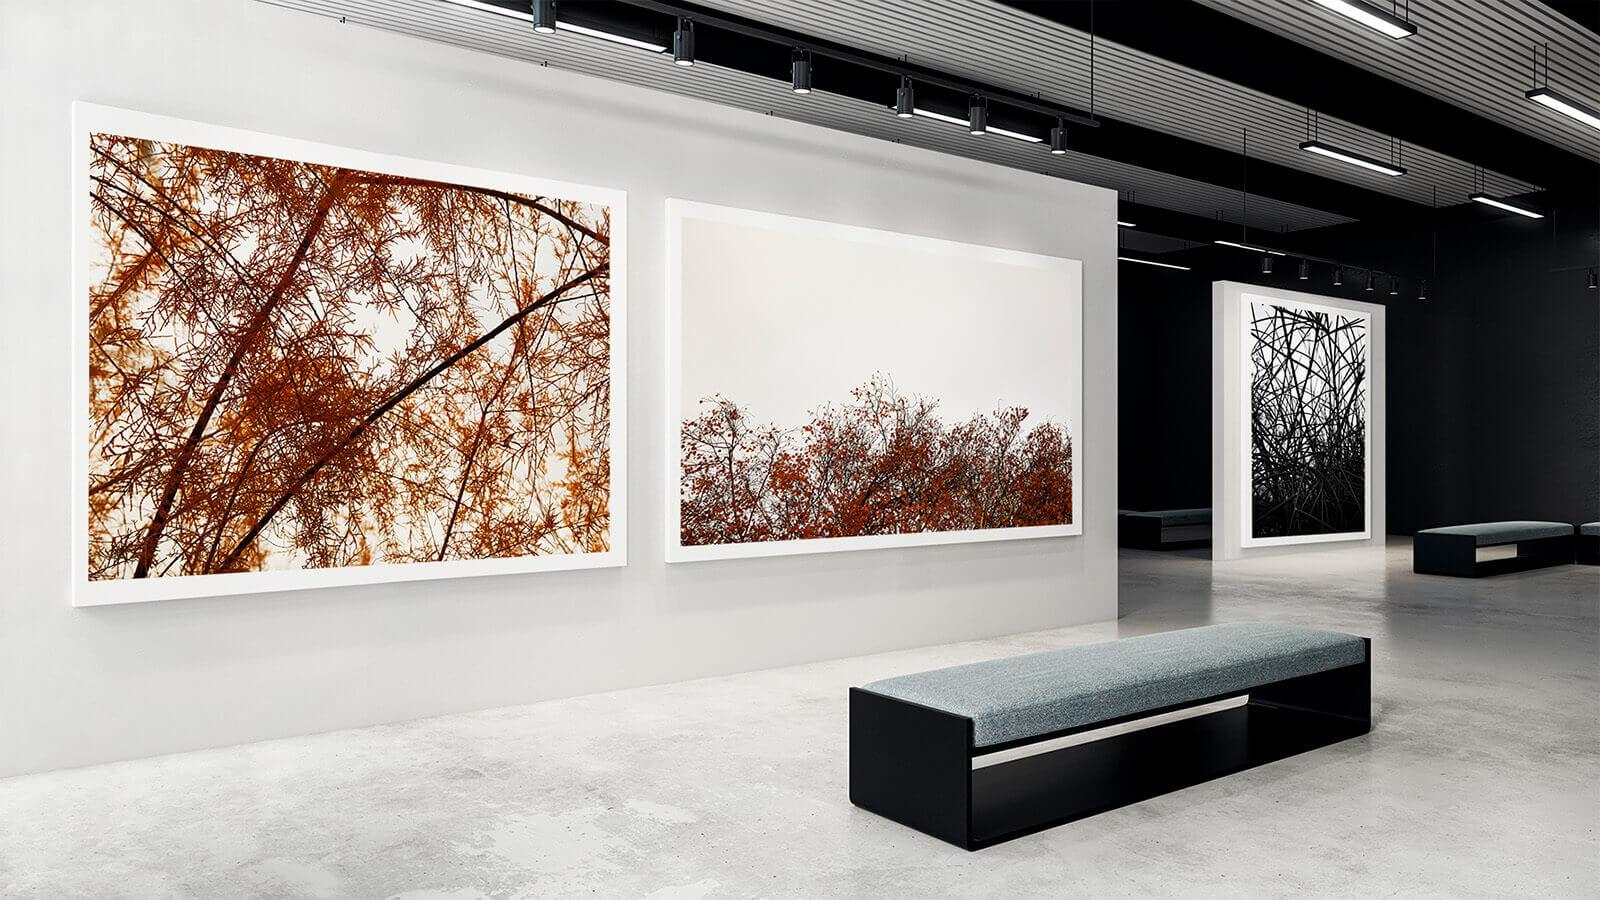 TAIYOKO-STUDIO-exposicion-Horno-Virtual-Gallery-branches-landscape-color-galeria-arte-fotografia-artistica-edicion-limitada-decoracion